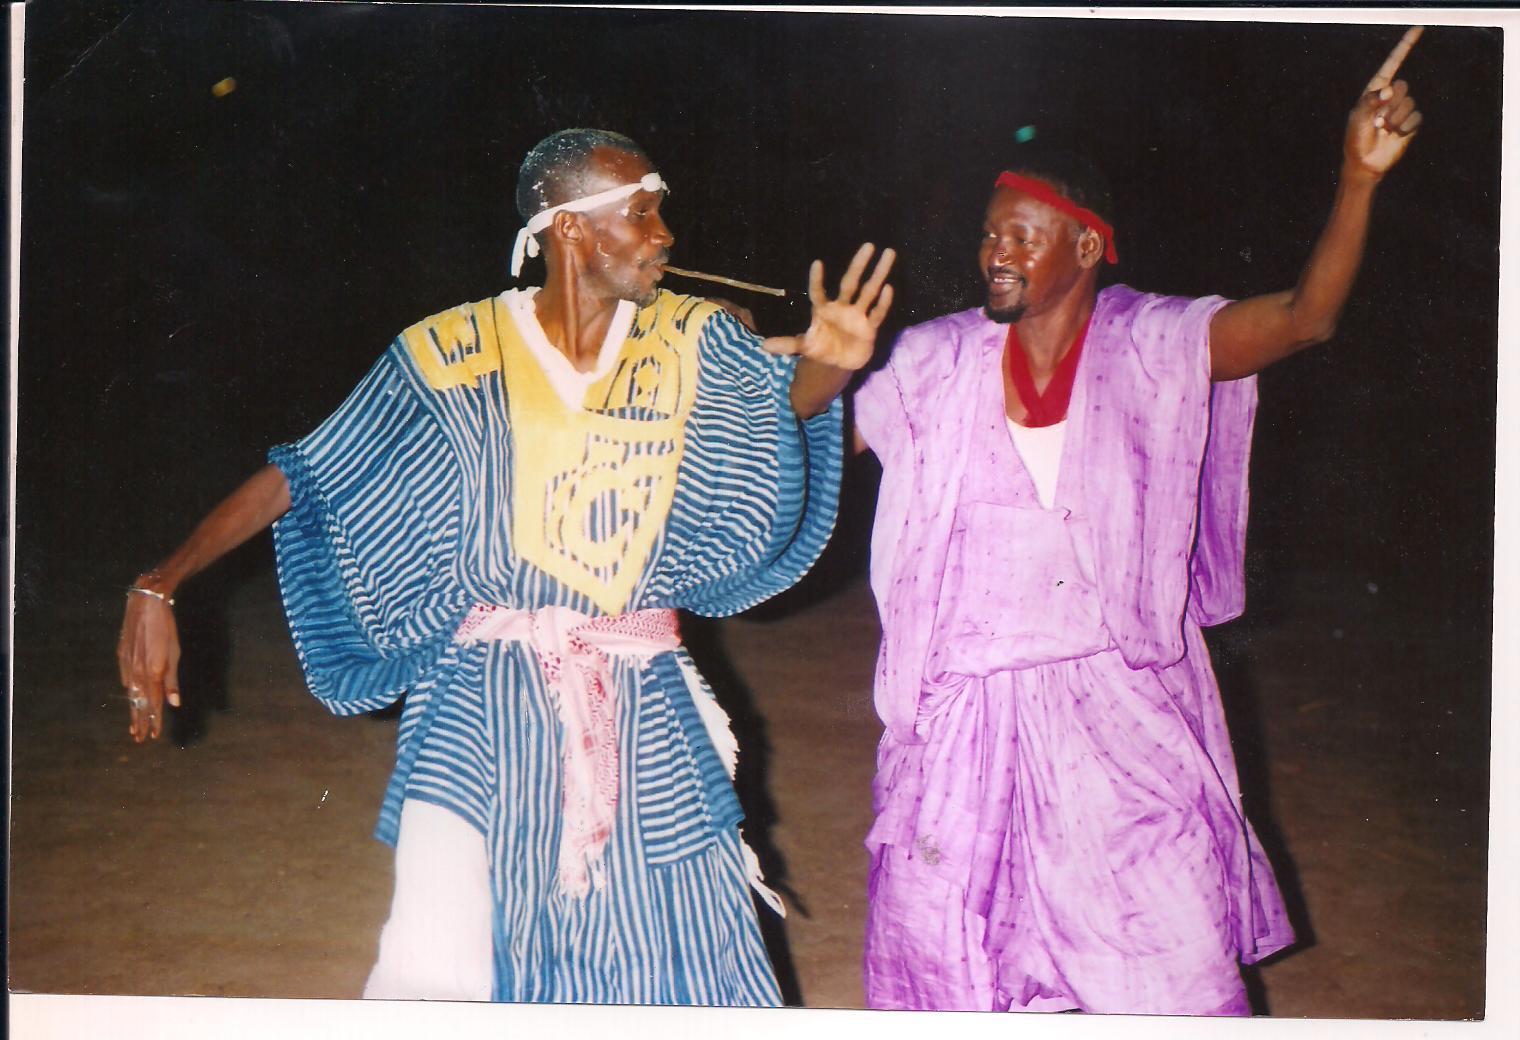 Gala de lutte traditionnelle Pulaar: Lamarane Diallo, le champion de Labbé terrasse Haadii Gadio, le champion de Matam